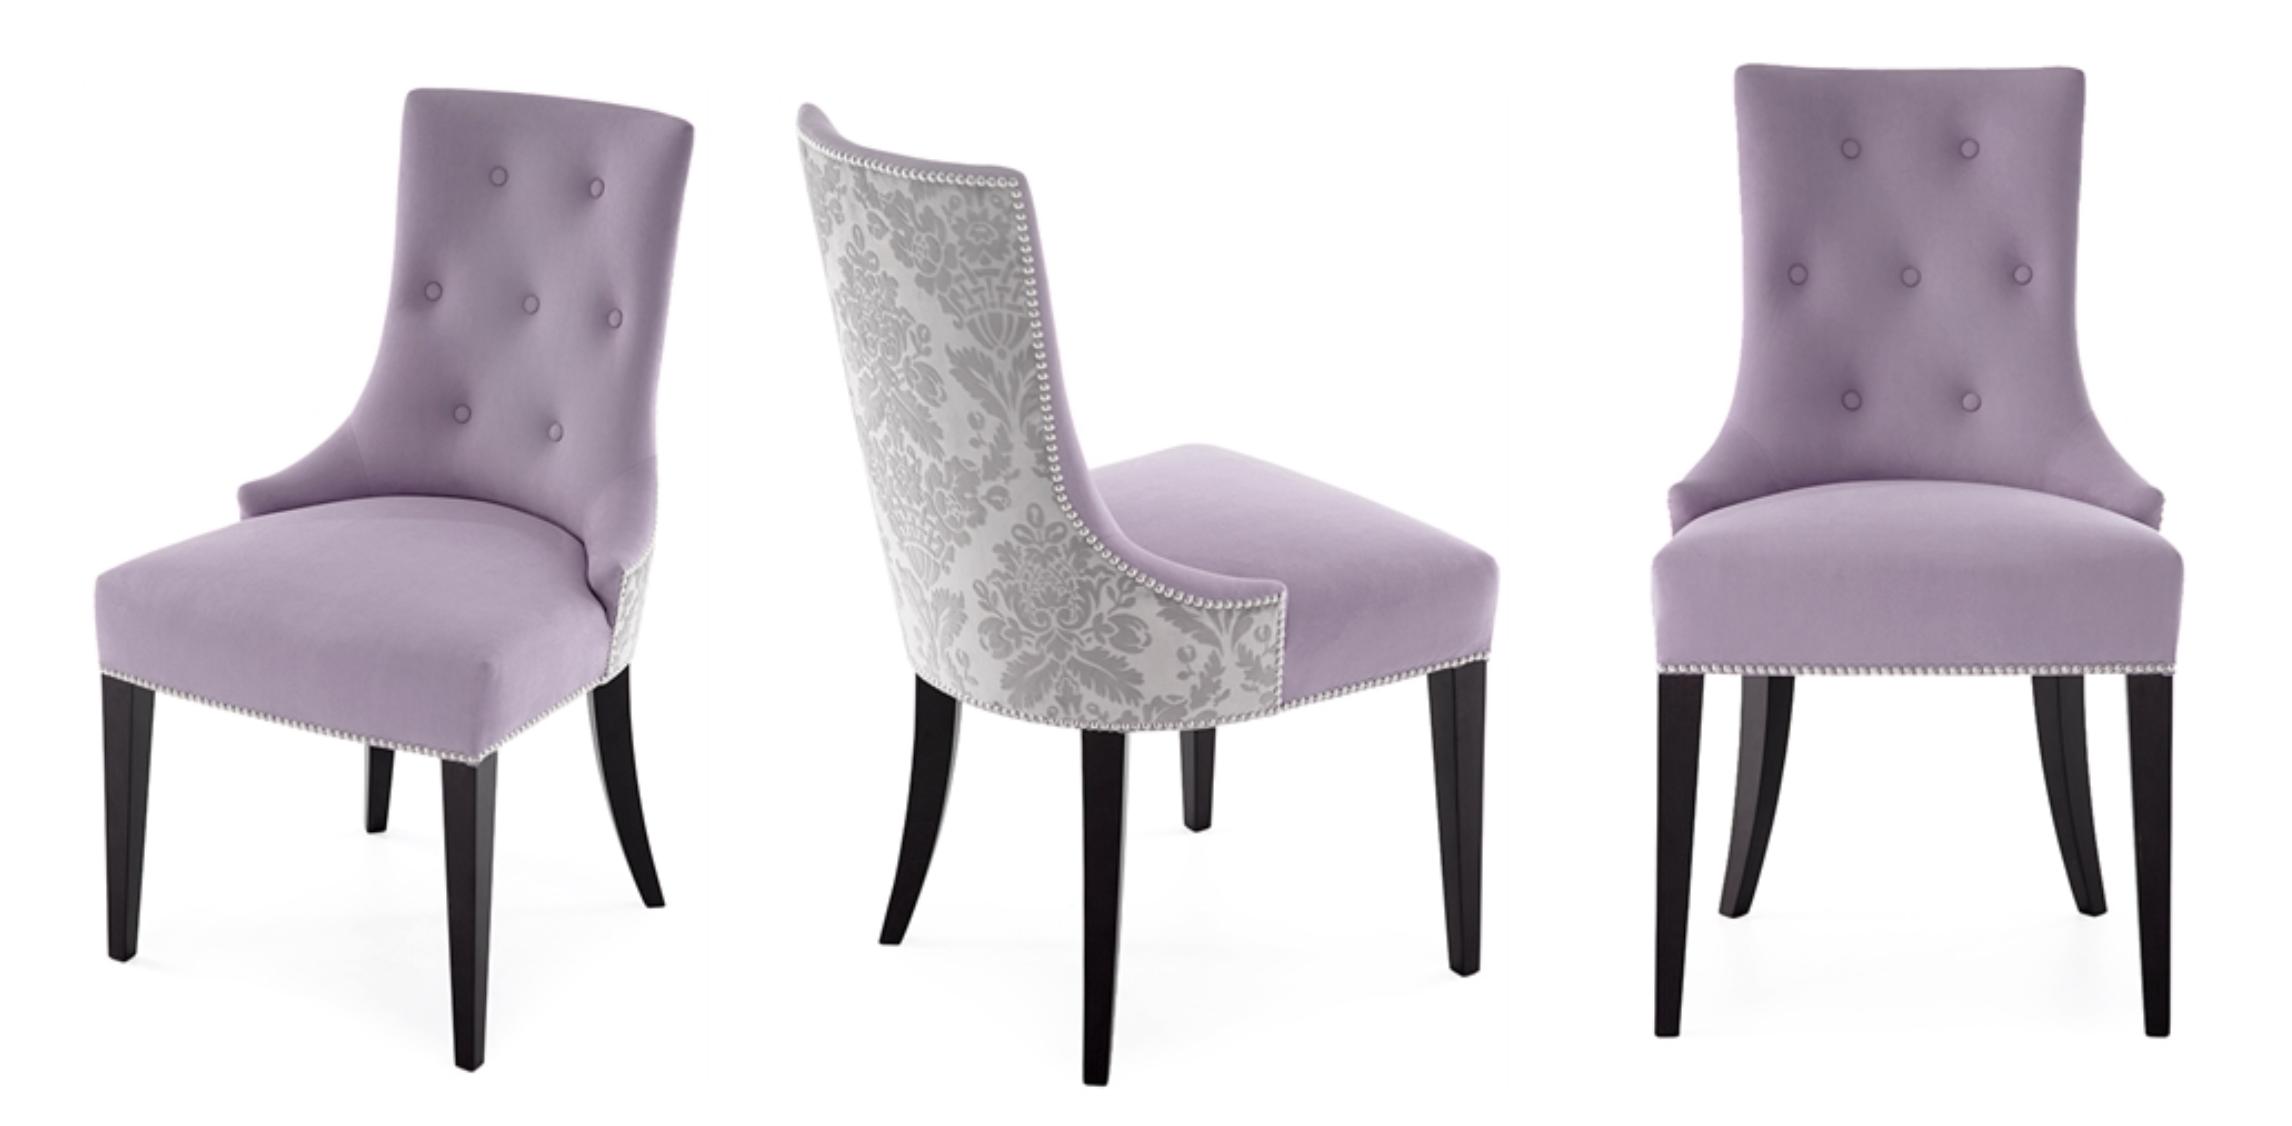 Sb Ka Charles Purple Dining Chairs Bespoke Furniture The